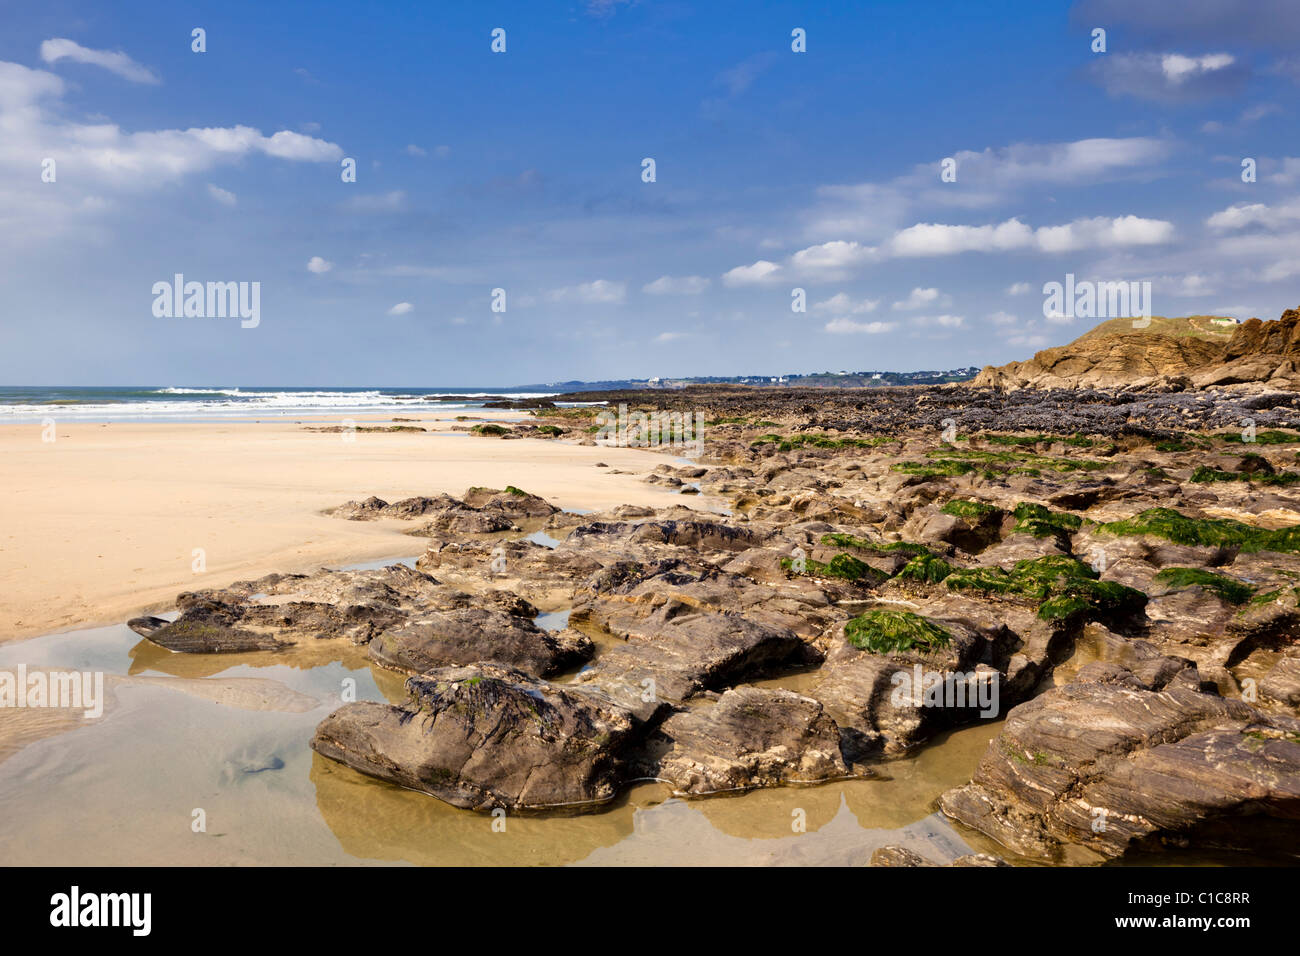 Best beaches on the Brittany coast, France: Penthièvre ...  |Beach Bretagne France